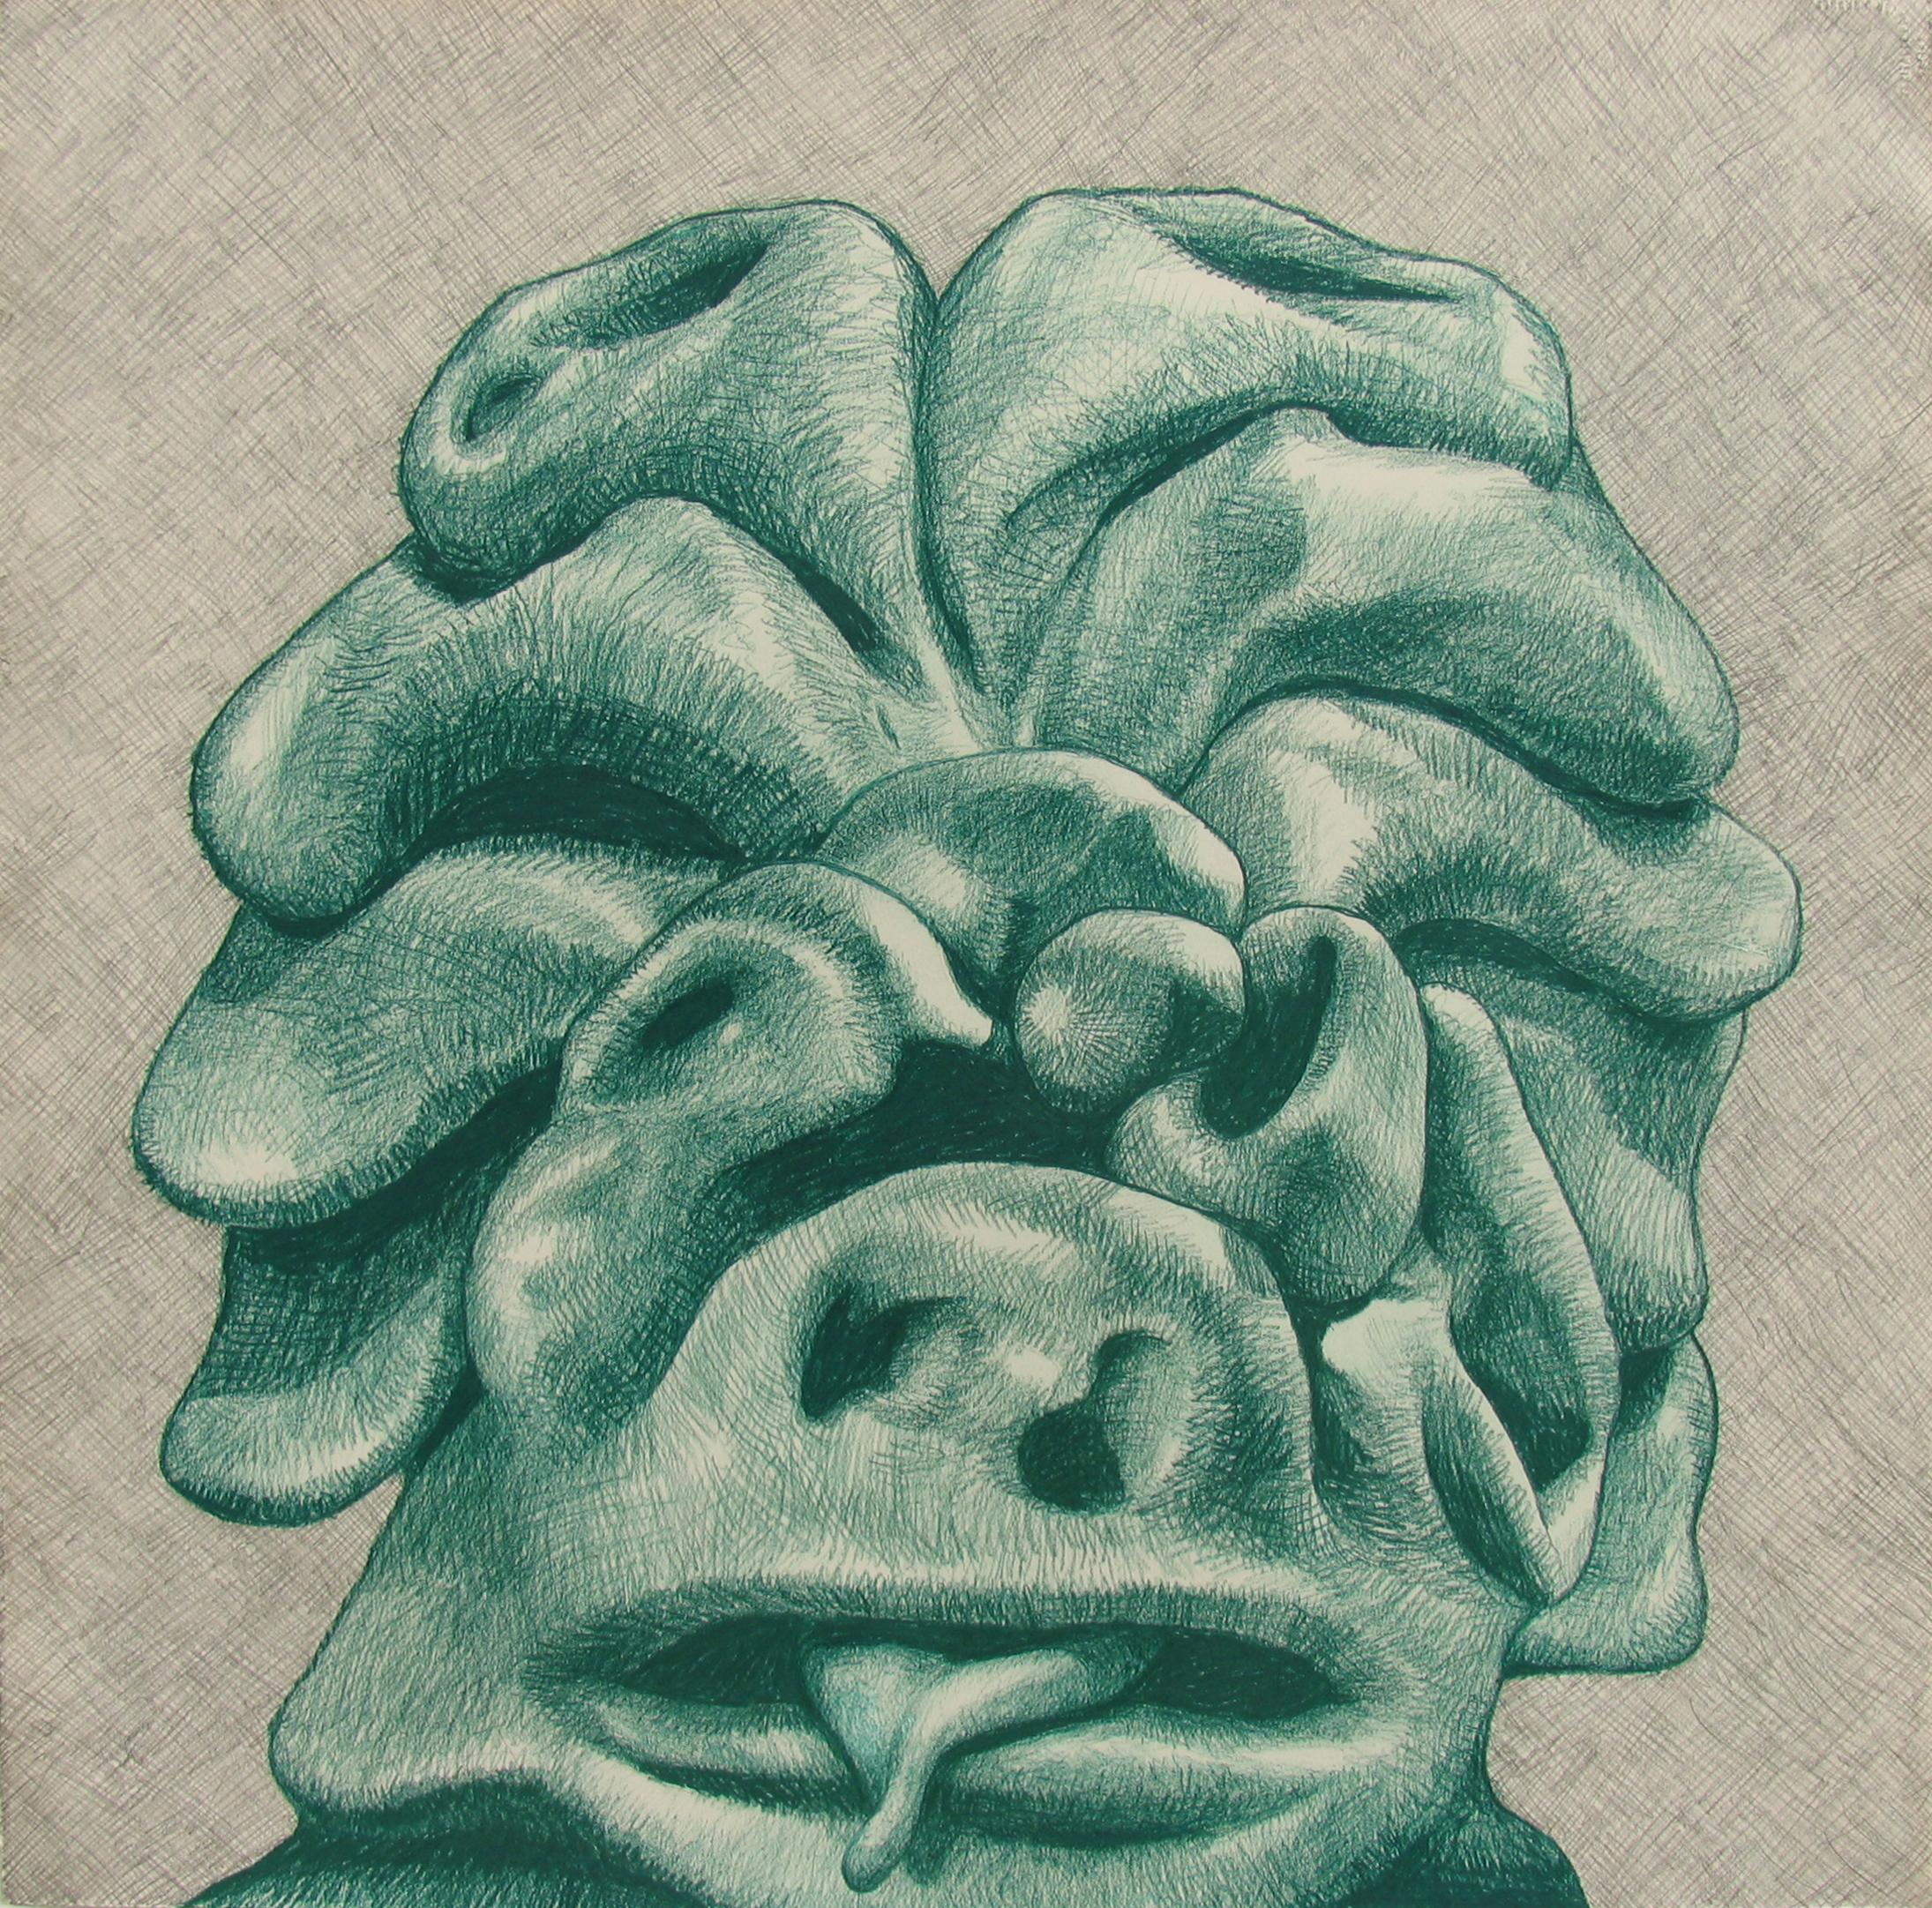 2016, crayon, graphite, 22x22 1/2 inches